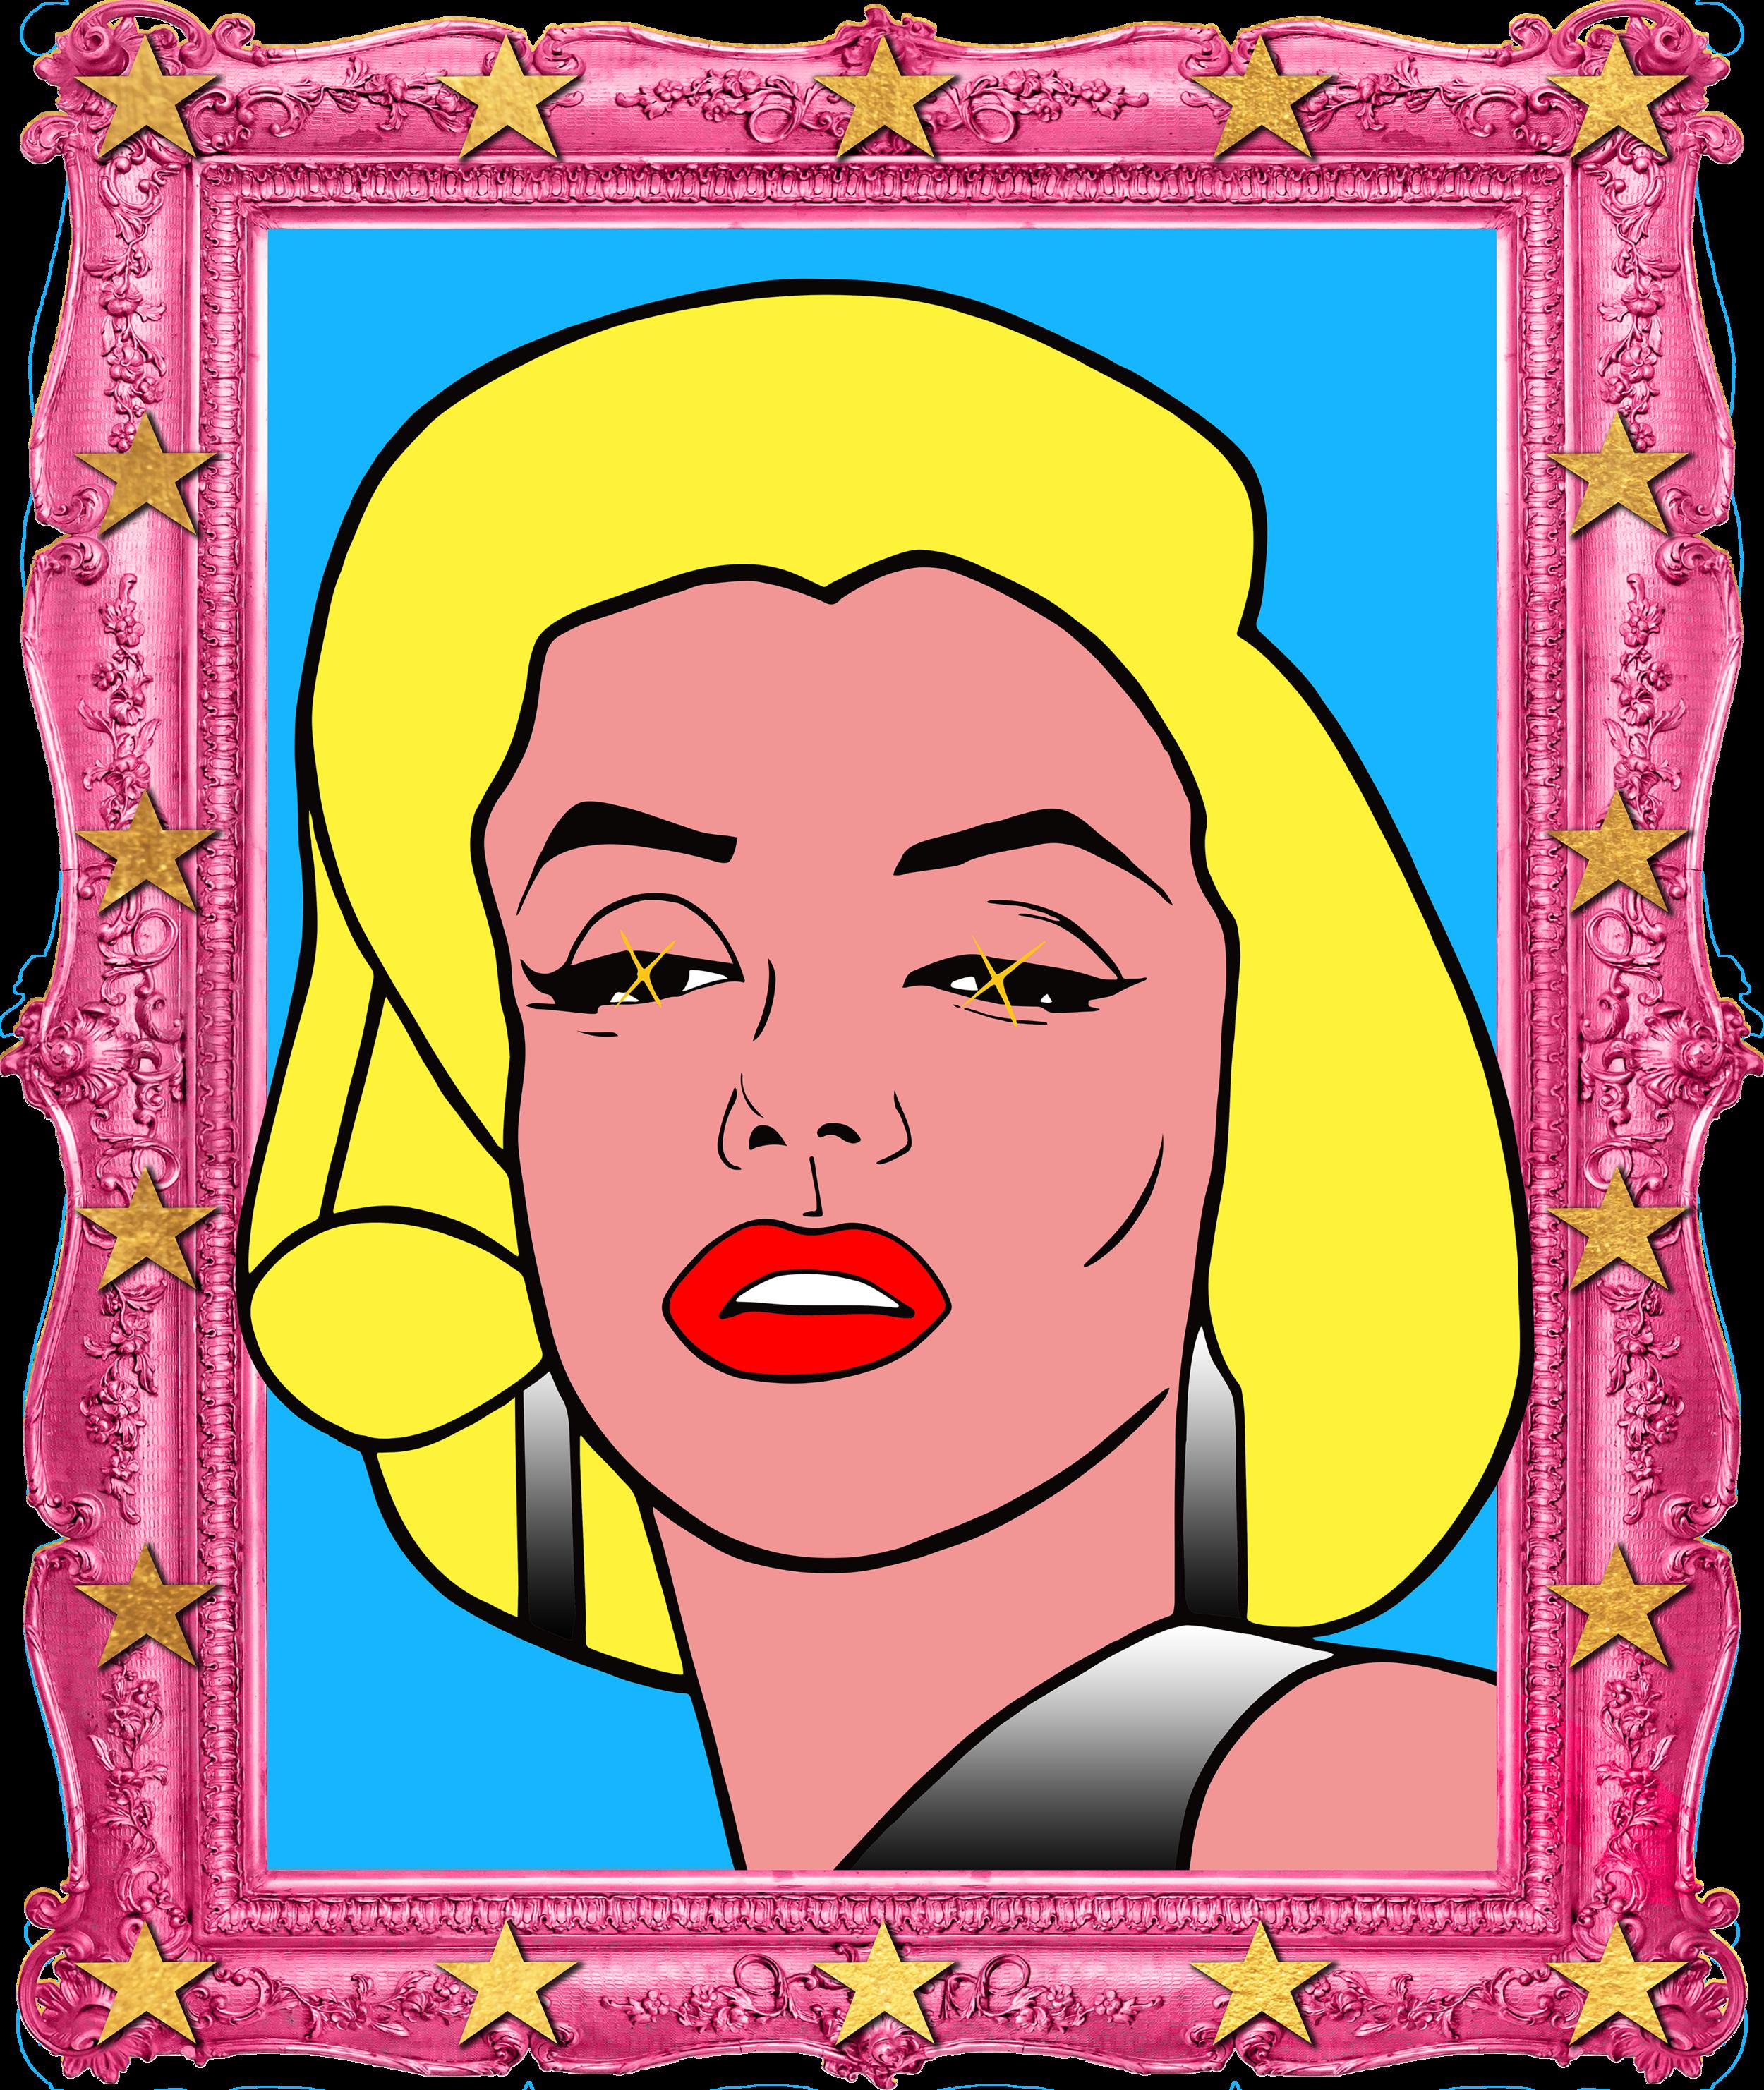 Marilyn_2.png